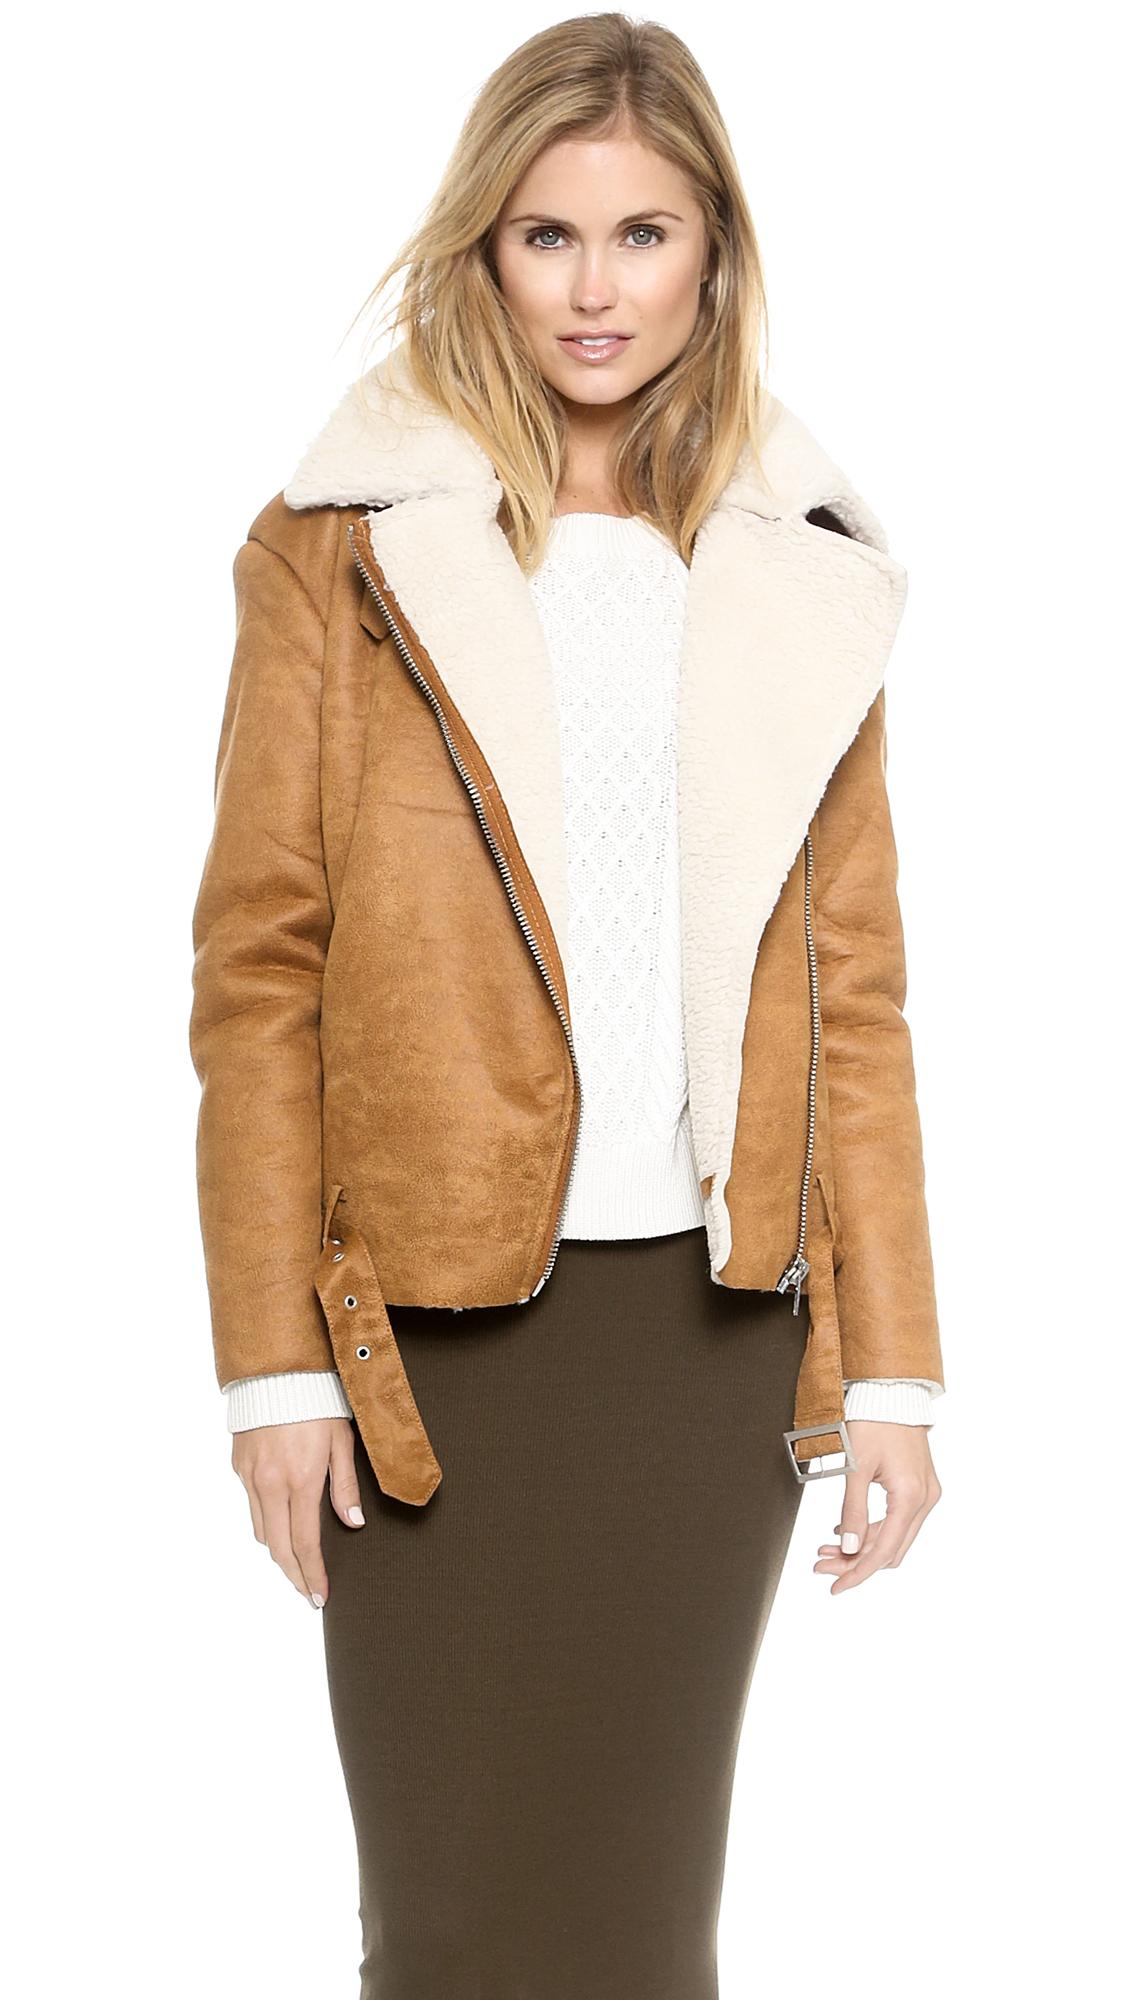 d28890323c2ec Glamorous Faux Shearling Jacket